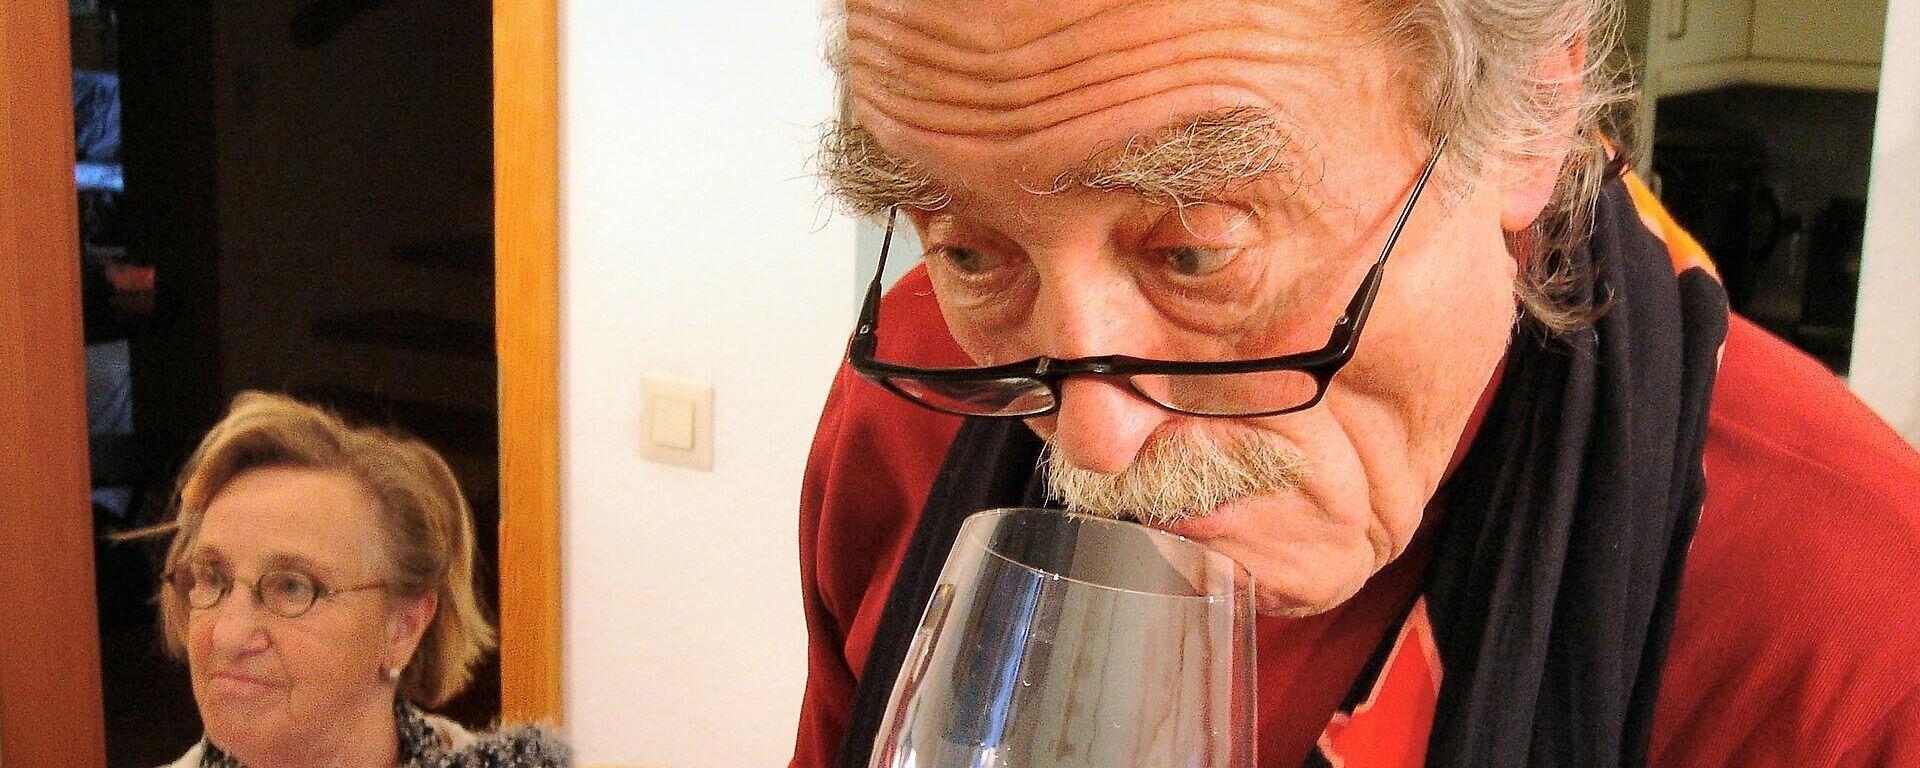 Un hombre oliendo vino - Sputnik Mundo, 1920, 23.03.2021